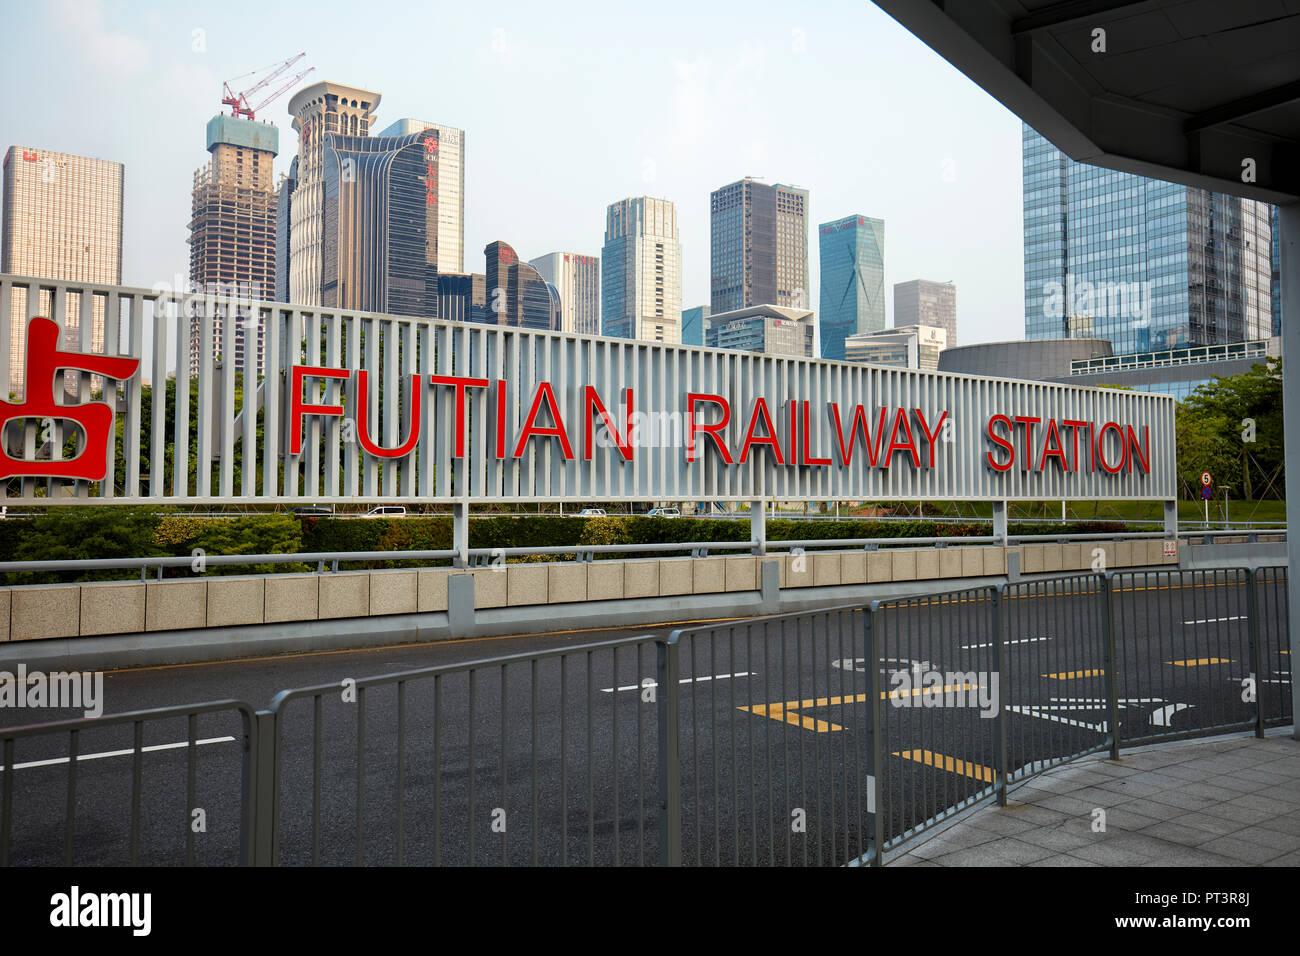 Futian railway station and high-rise buildings of Futian CBD. Shenzhen, Guangdong Province, China. - Stock Image